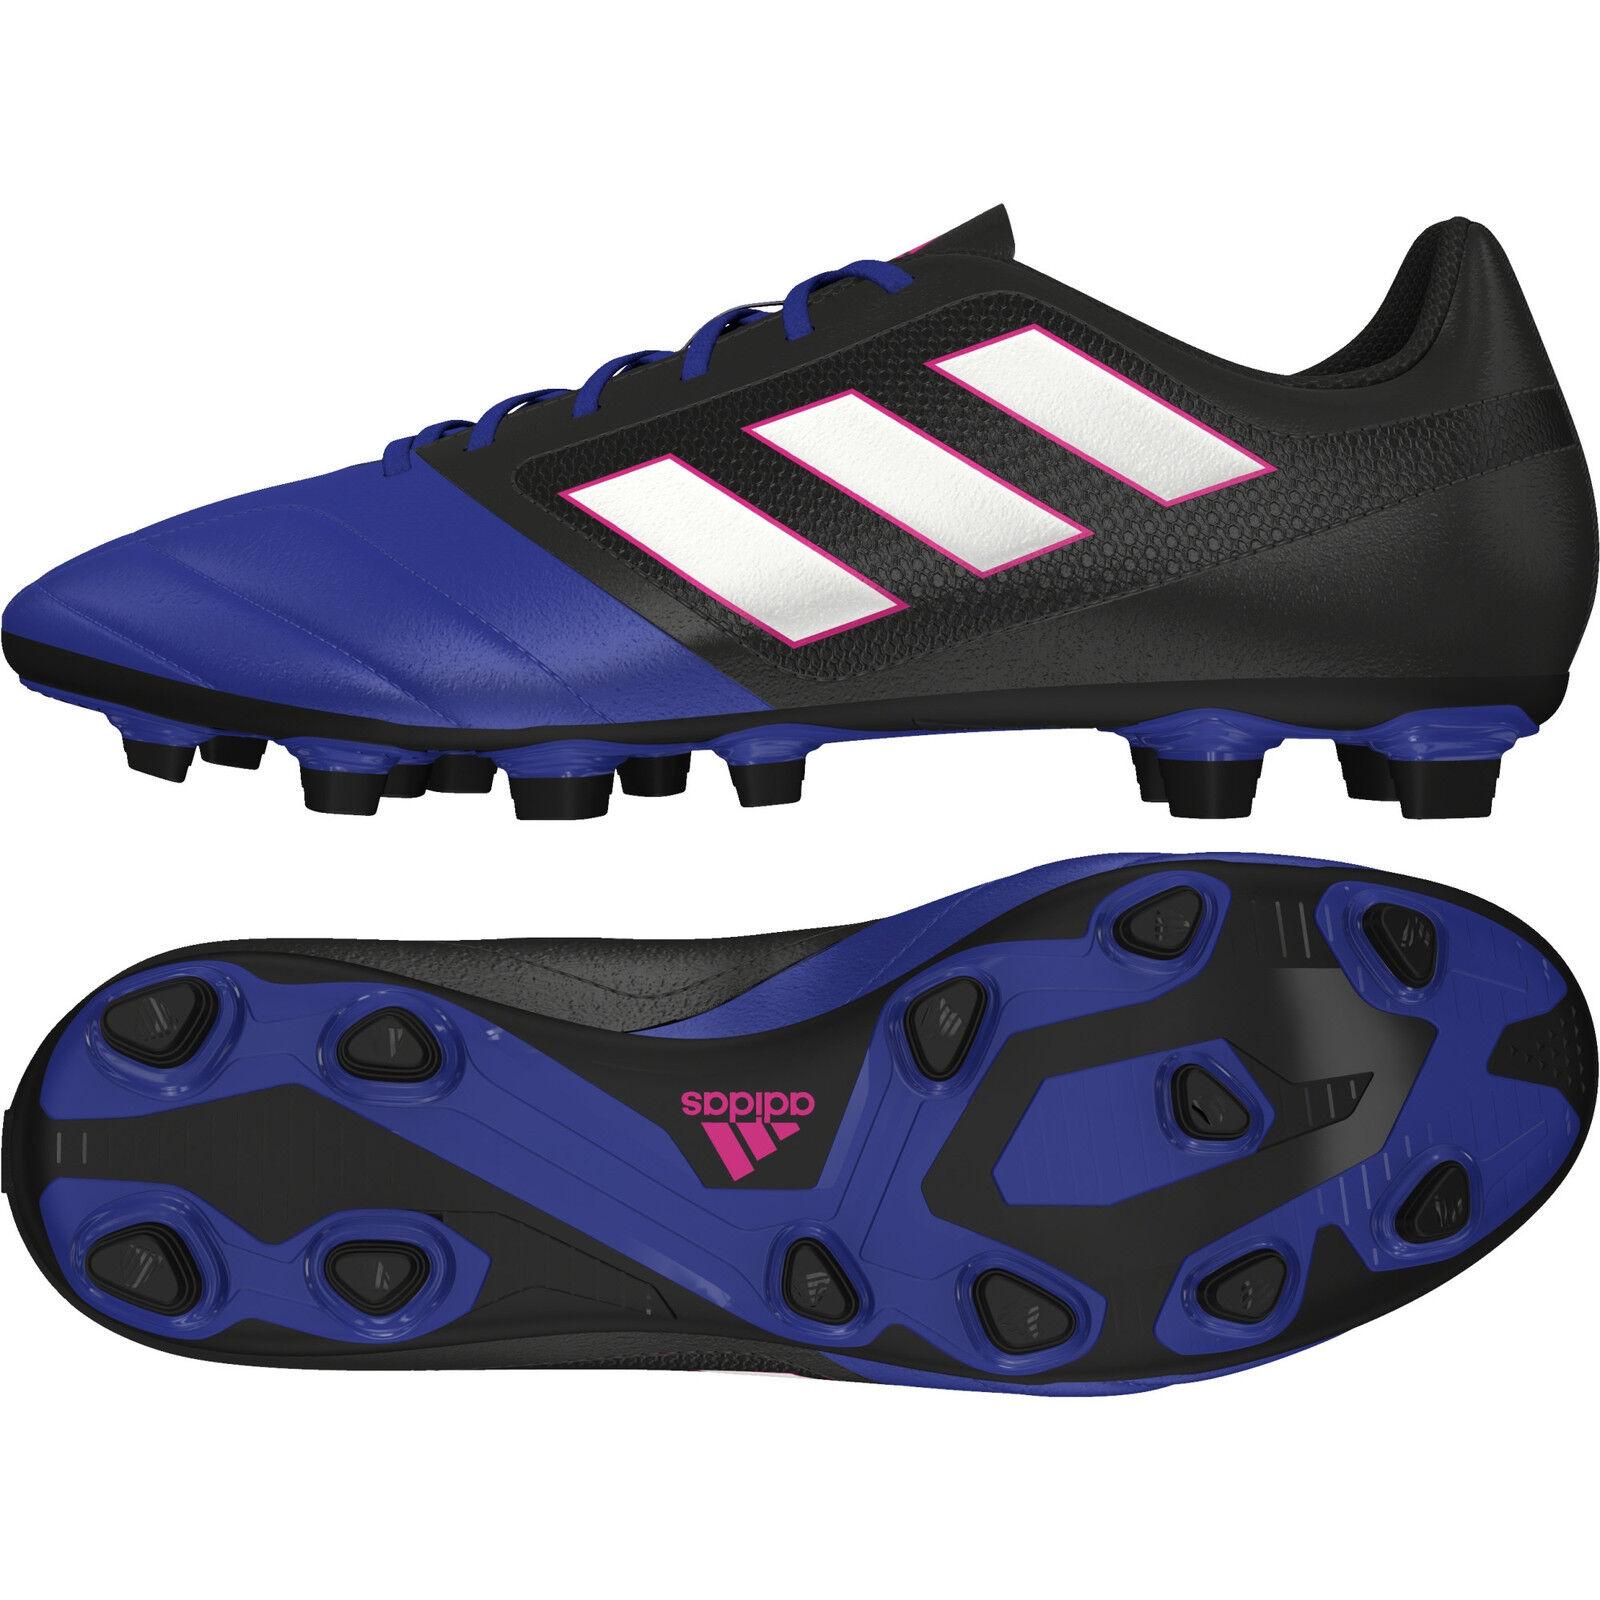 Adidas Ace 17.4 FXG BA9688 scarpa da calcio calcetto UOMO Col. Royal Nero NEW